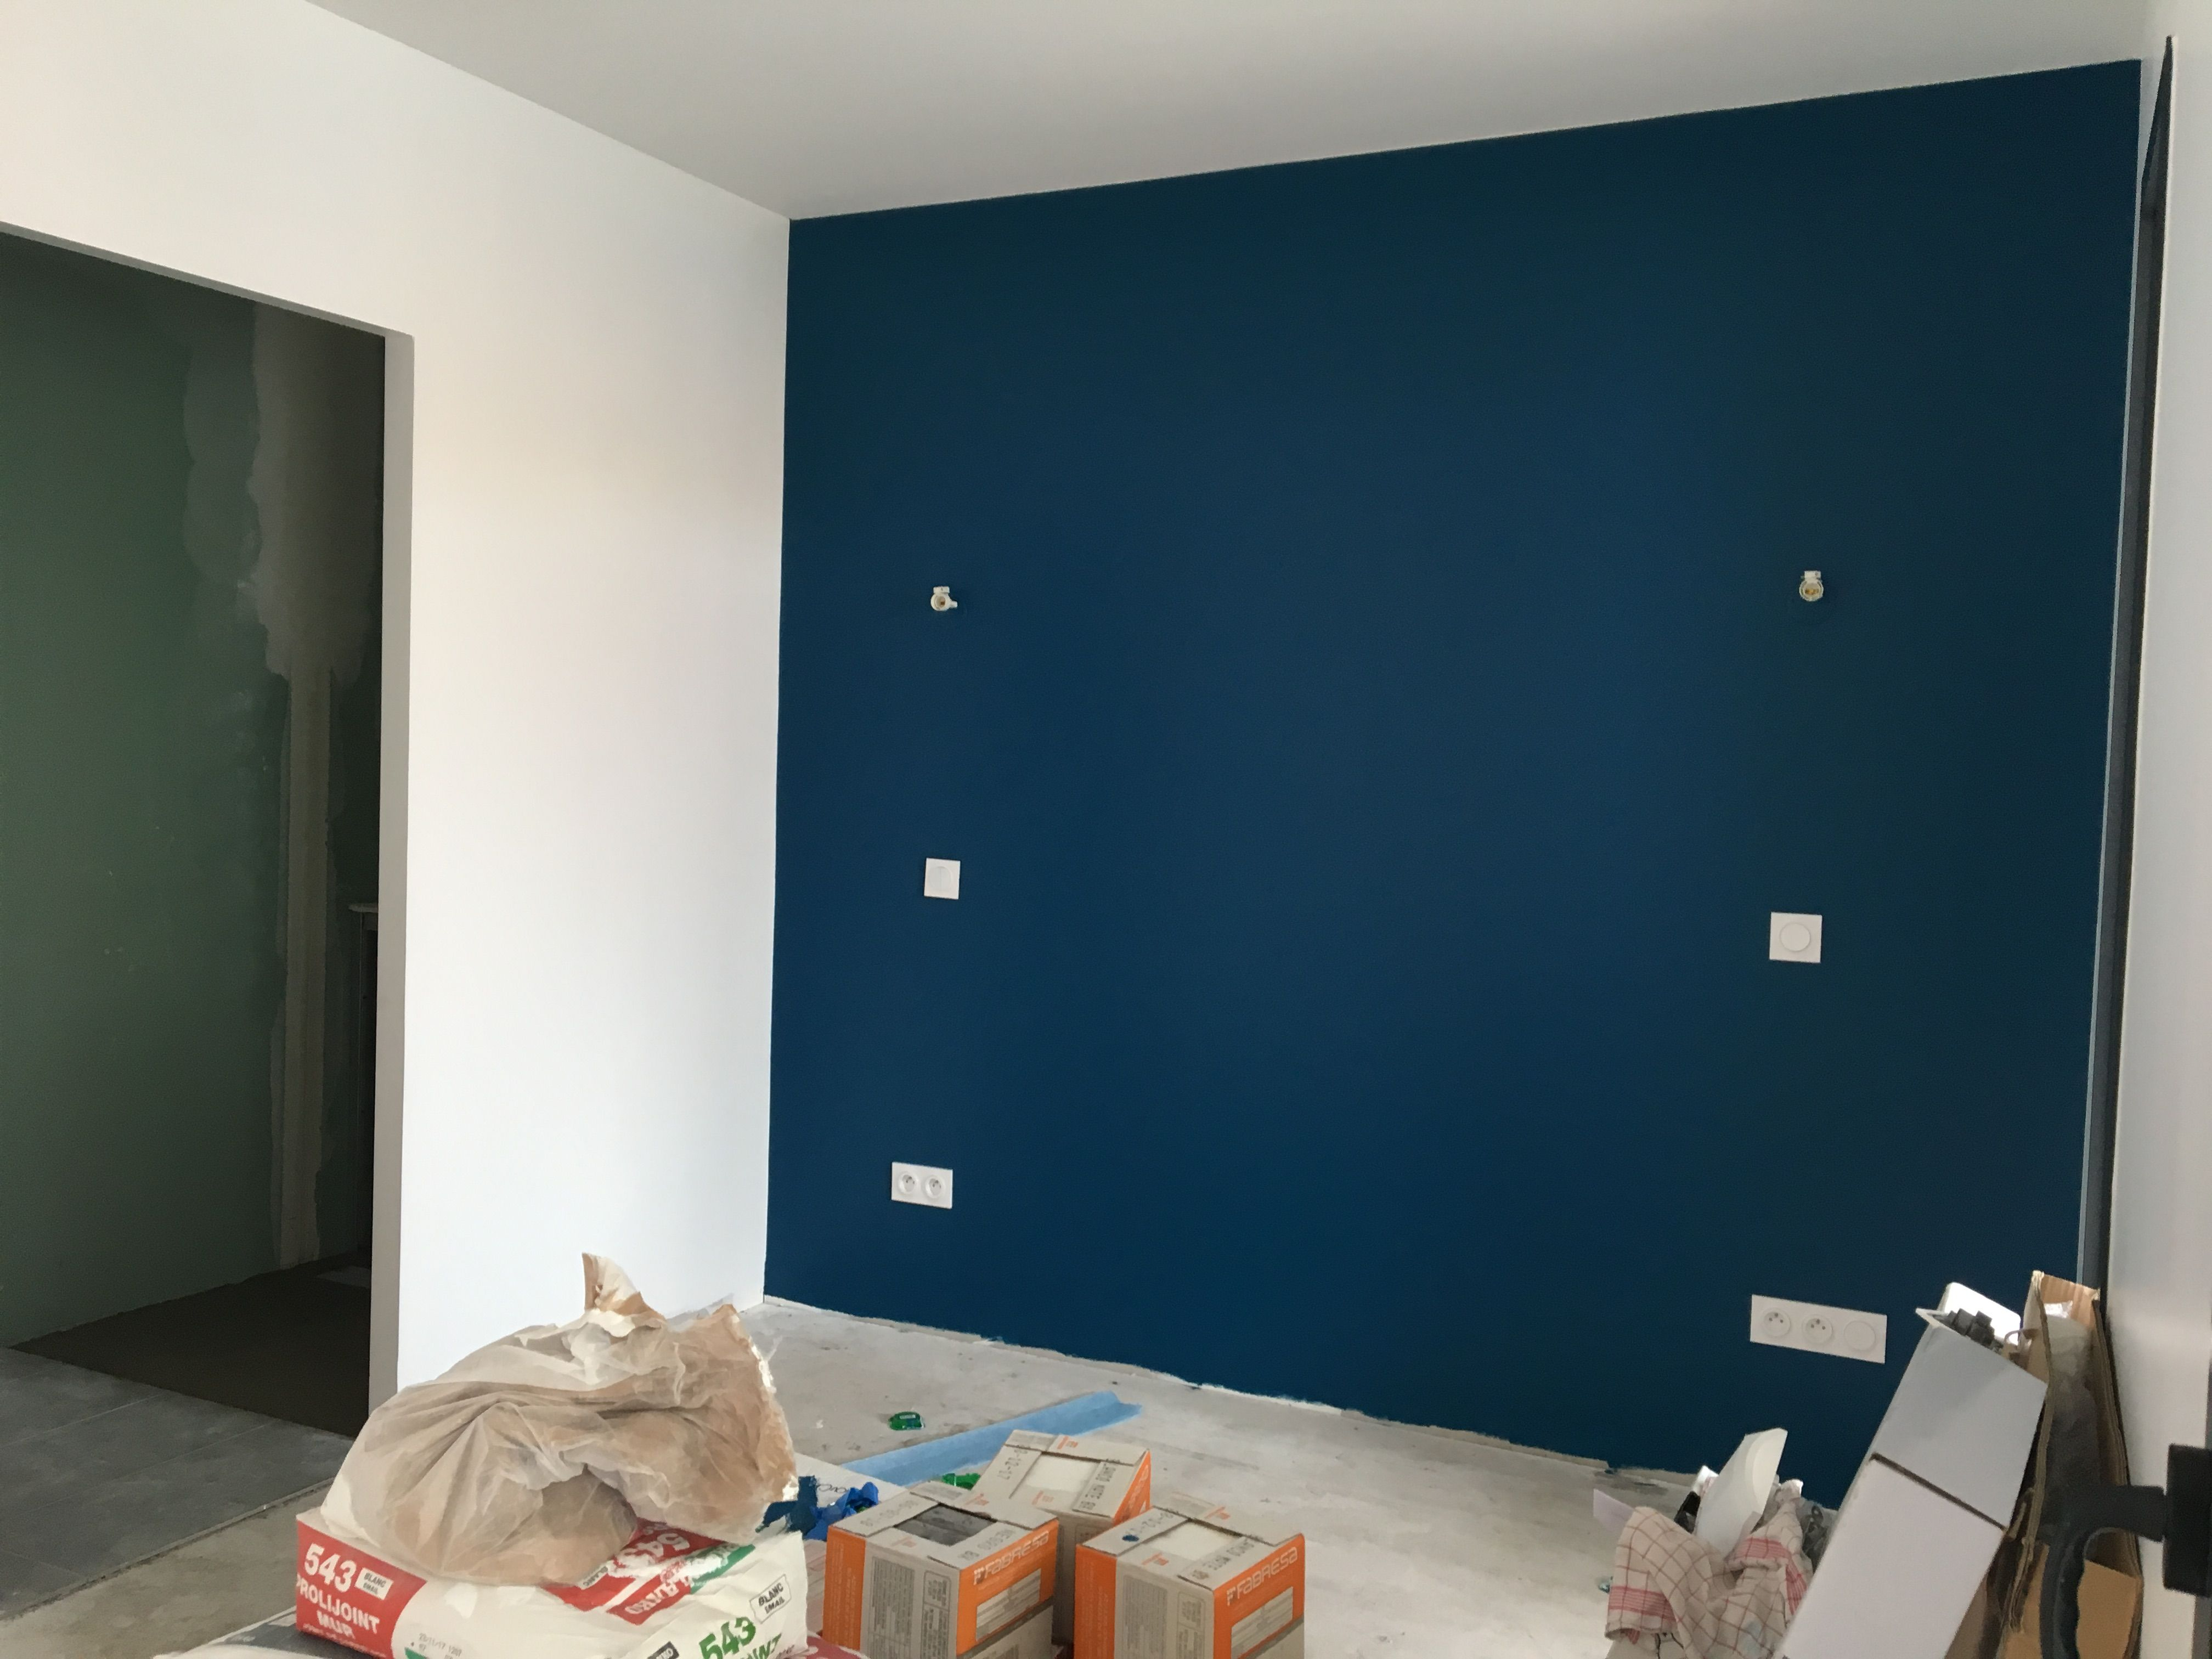 Deco Salon Mur Bleu chambre parentale bleu nipissing | chambre parentale bleu